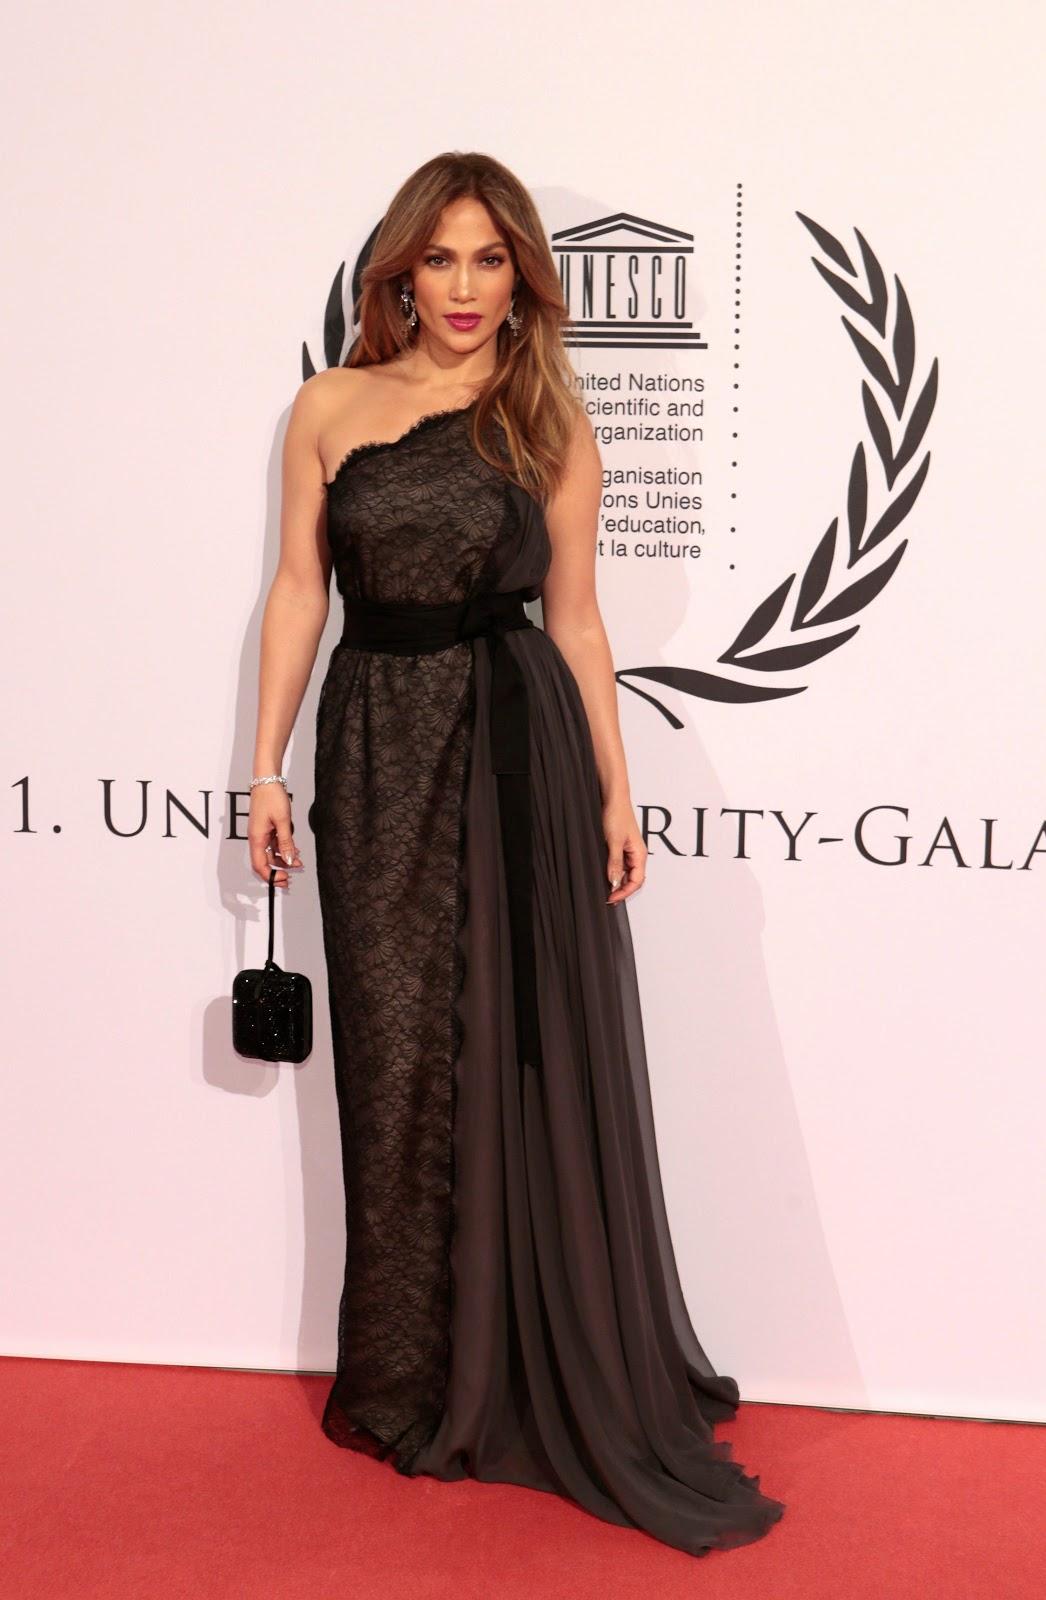 http://4.bp.blogspot.com/-R5io4kuCZ_A/UIzDDOqeWQI/AAAAAAAAWv0/rX_TFp593LU/s1600/Jennifer+Lopez++attends+2012+UNESCO+Charity+Gala+2012+in+D%C3%BCsseldorf+October_27_2012+-0+5.jpg